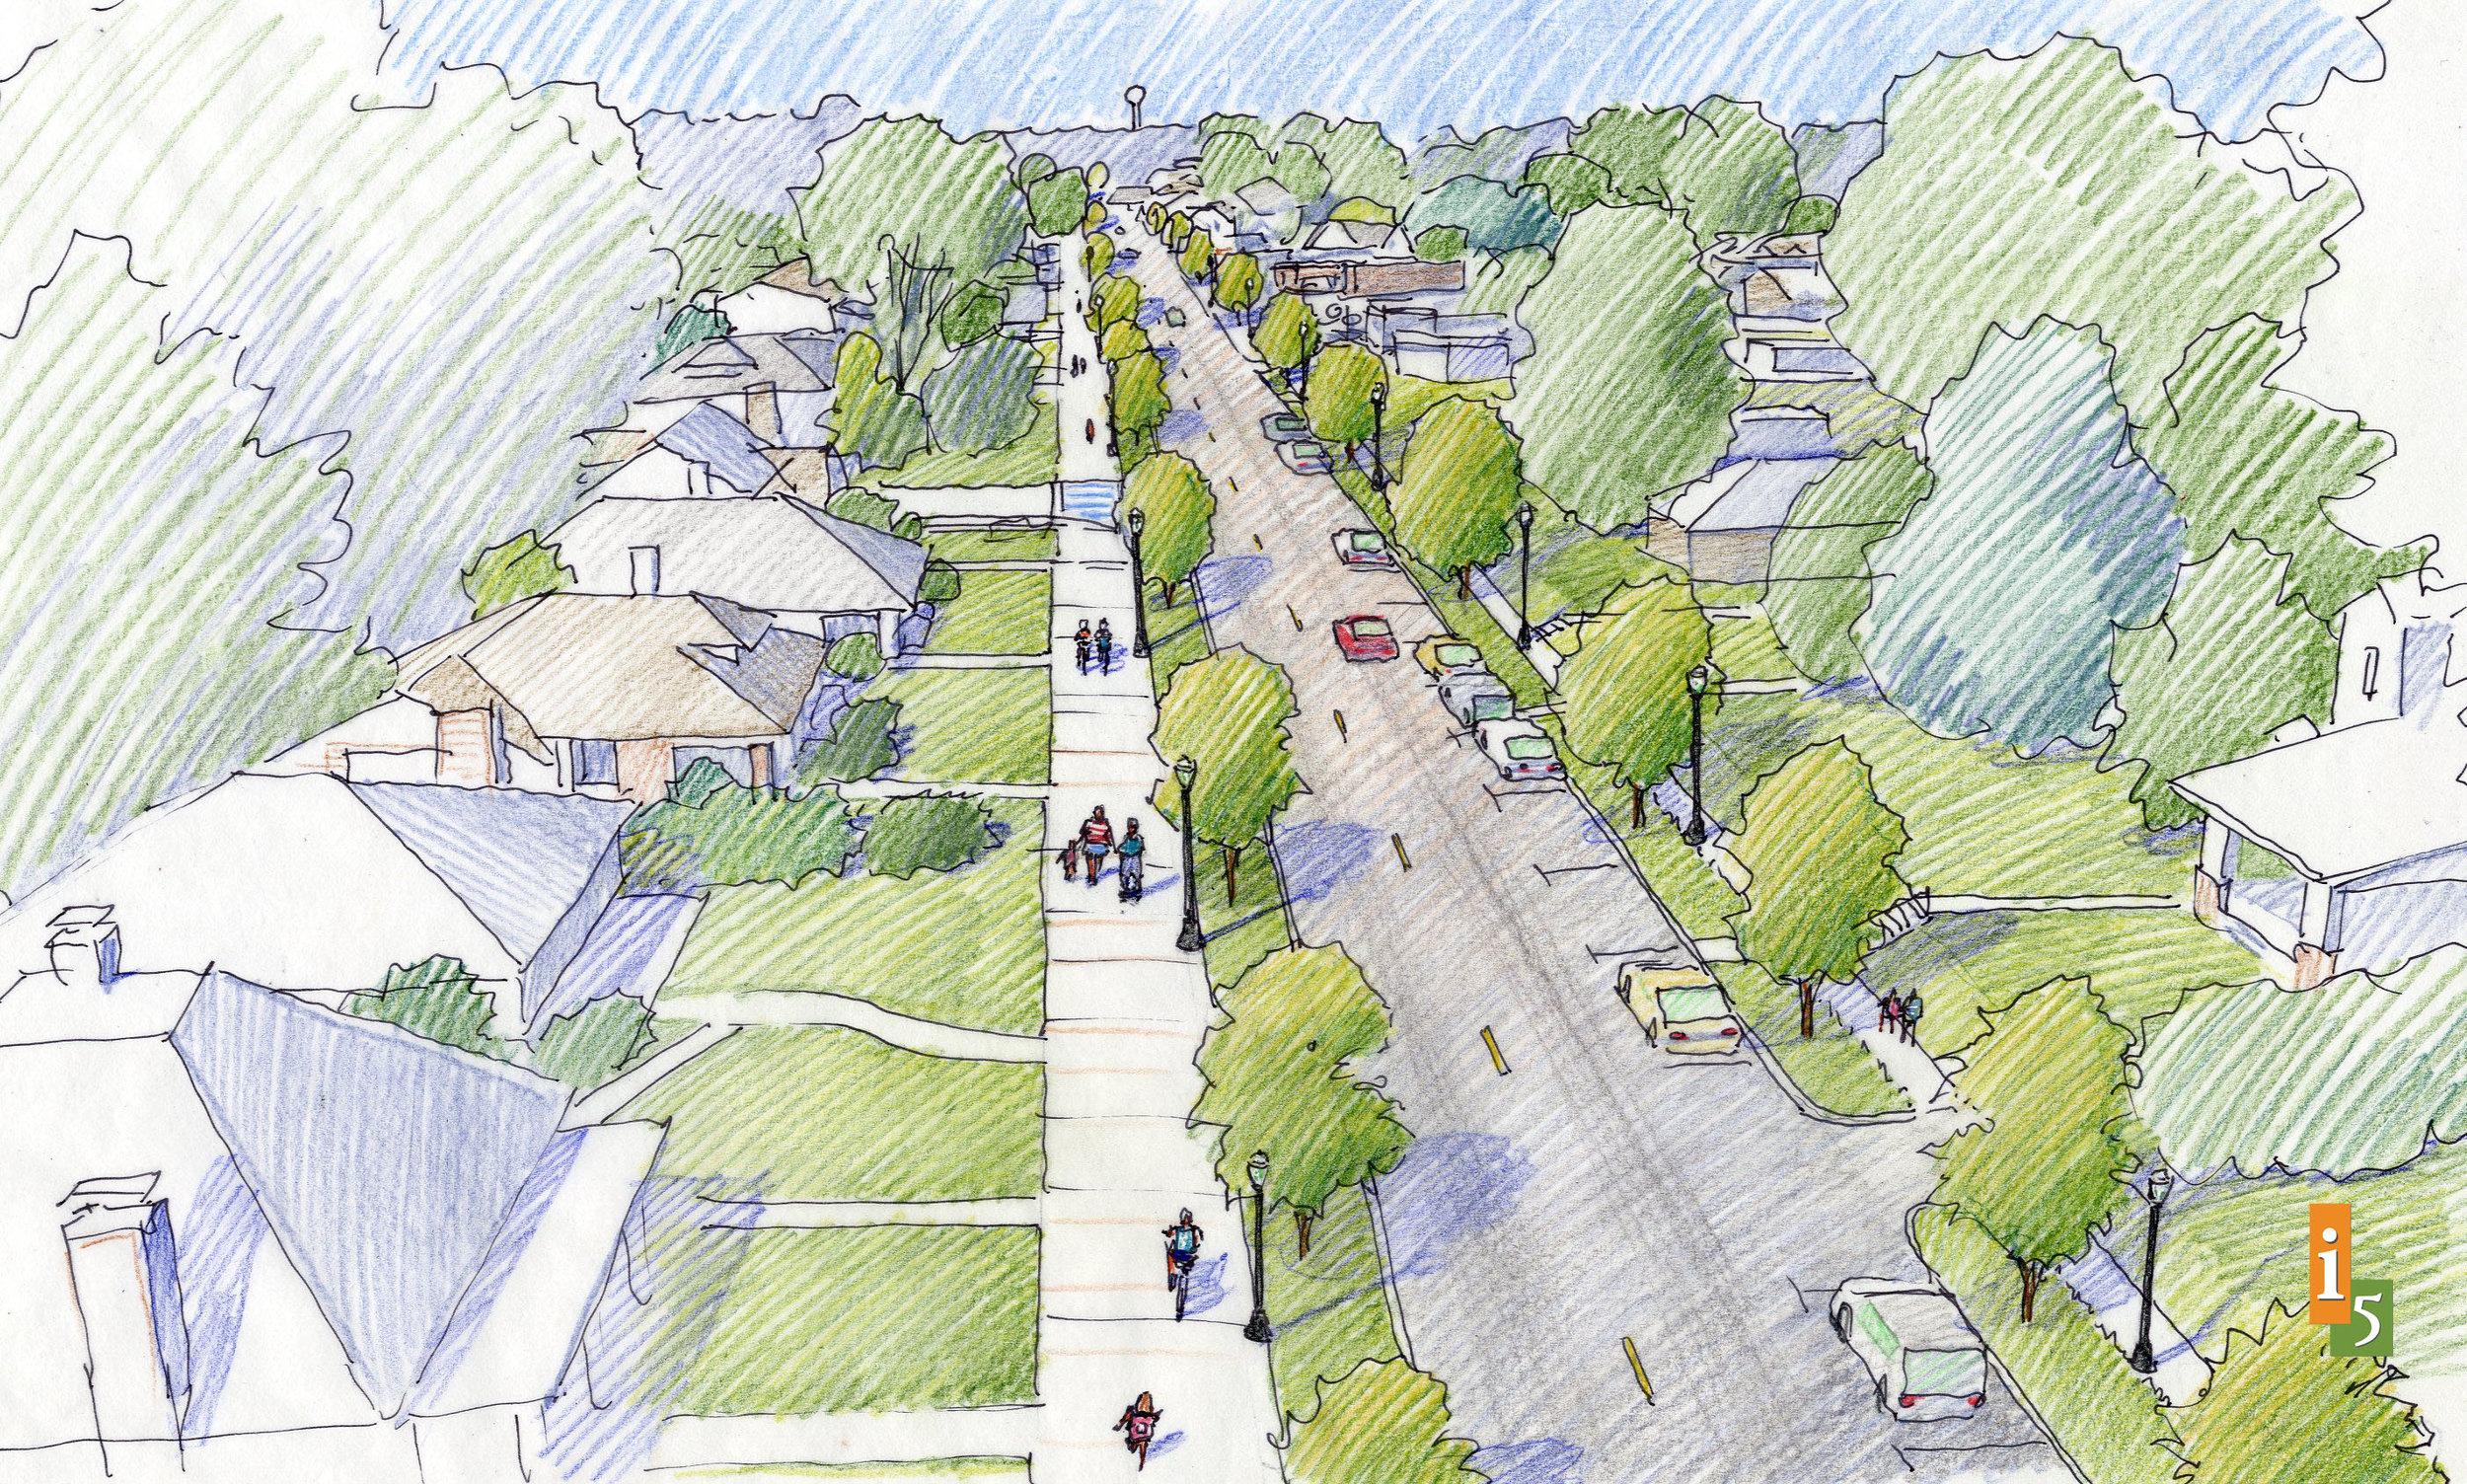 Proposed concept along St. Louis Road.